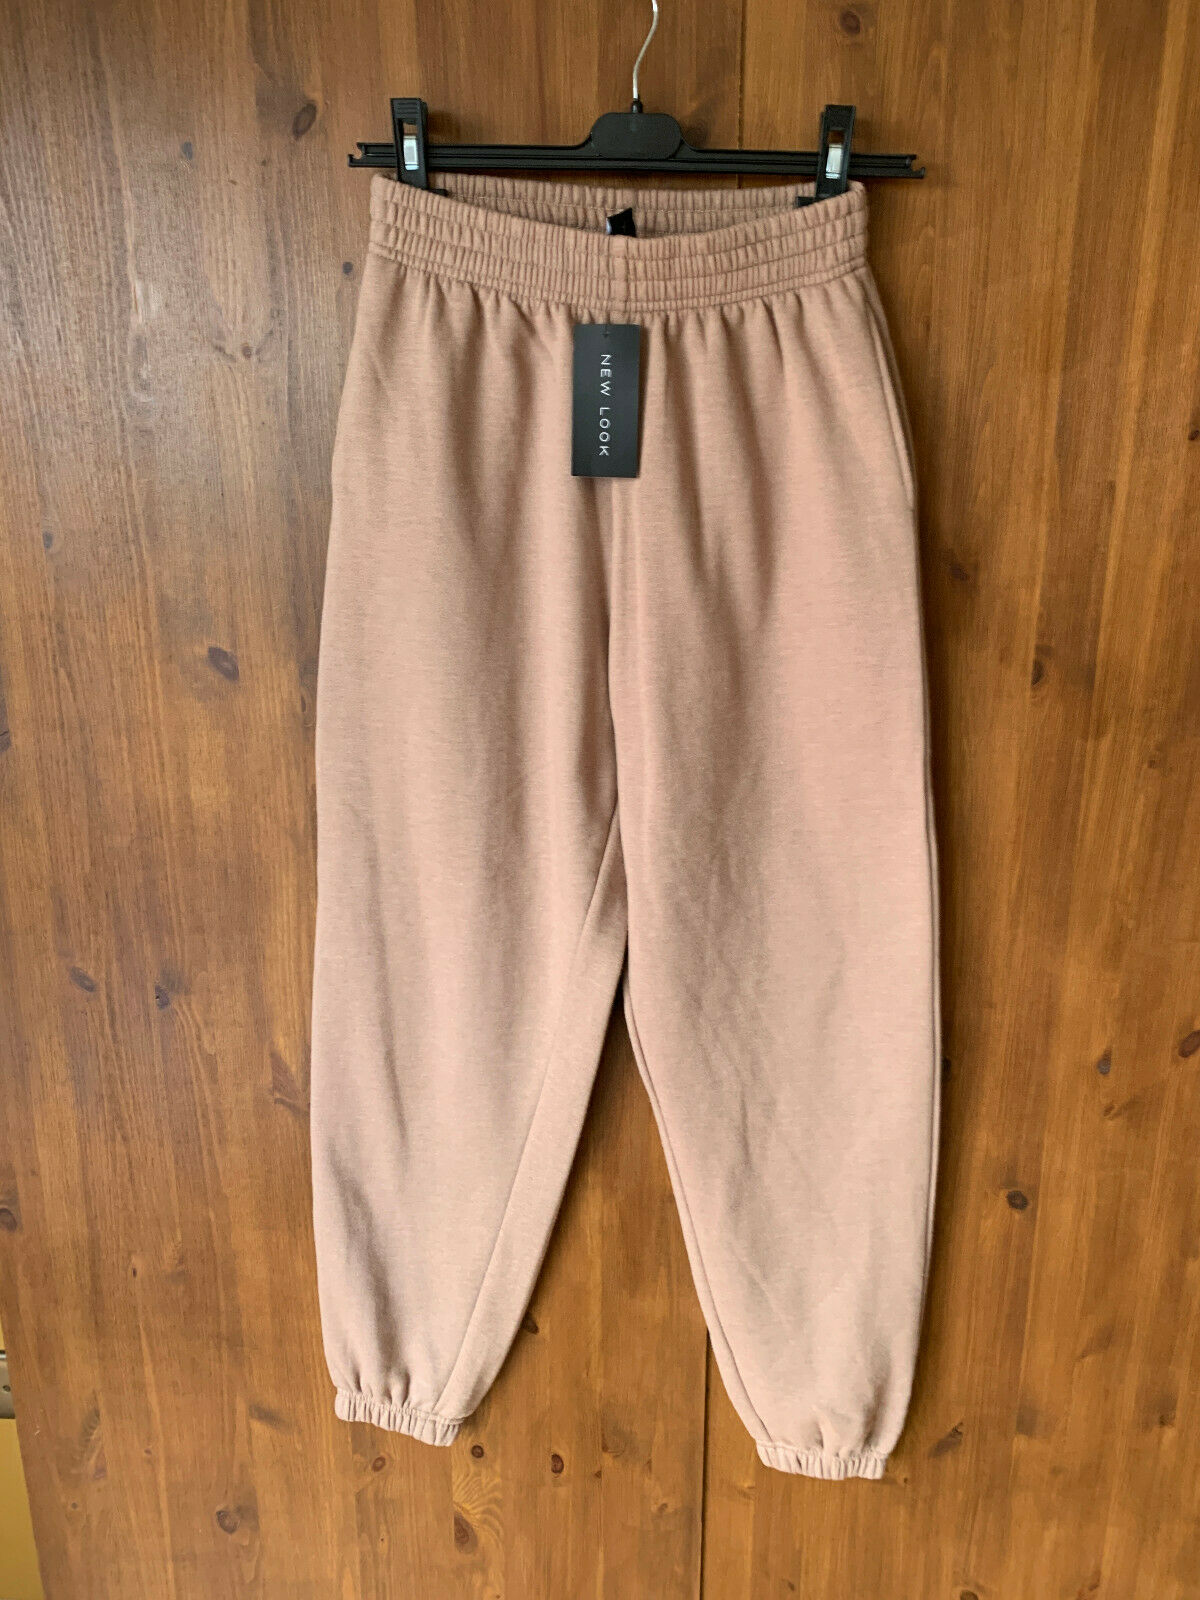 AW 2020 - NEW LOOK JOGGERS Tan Brown Cuffed Trousers Jersey UK 8 / 36 - BNWT